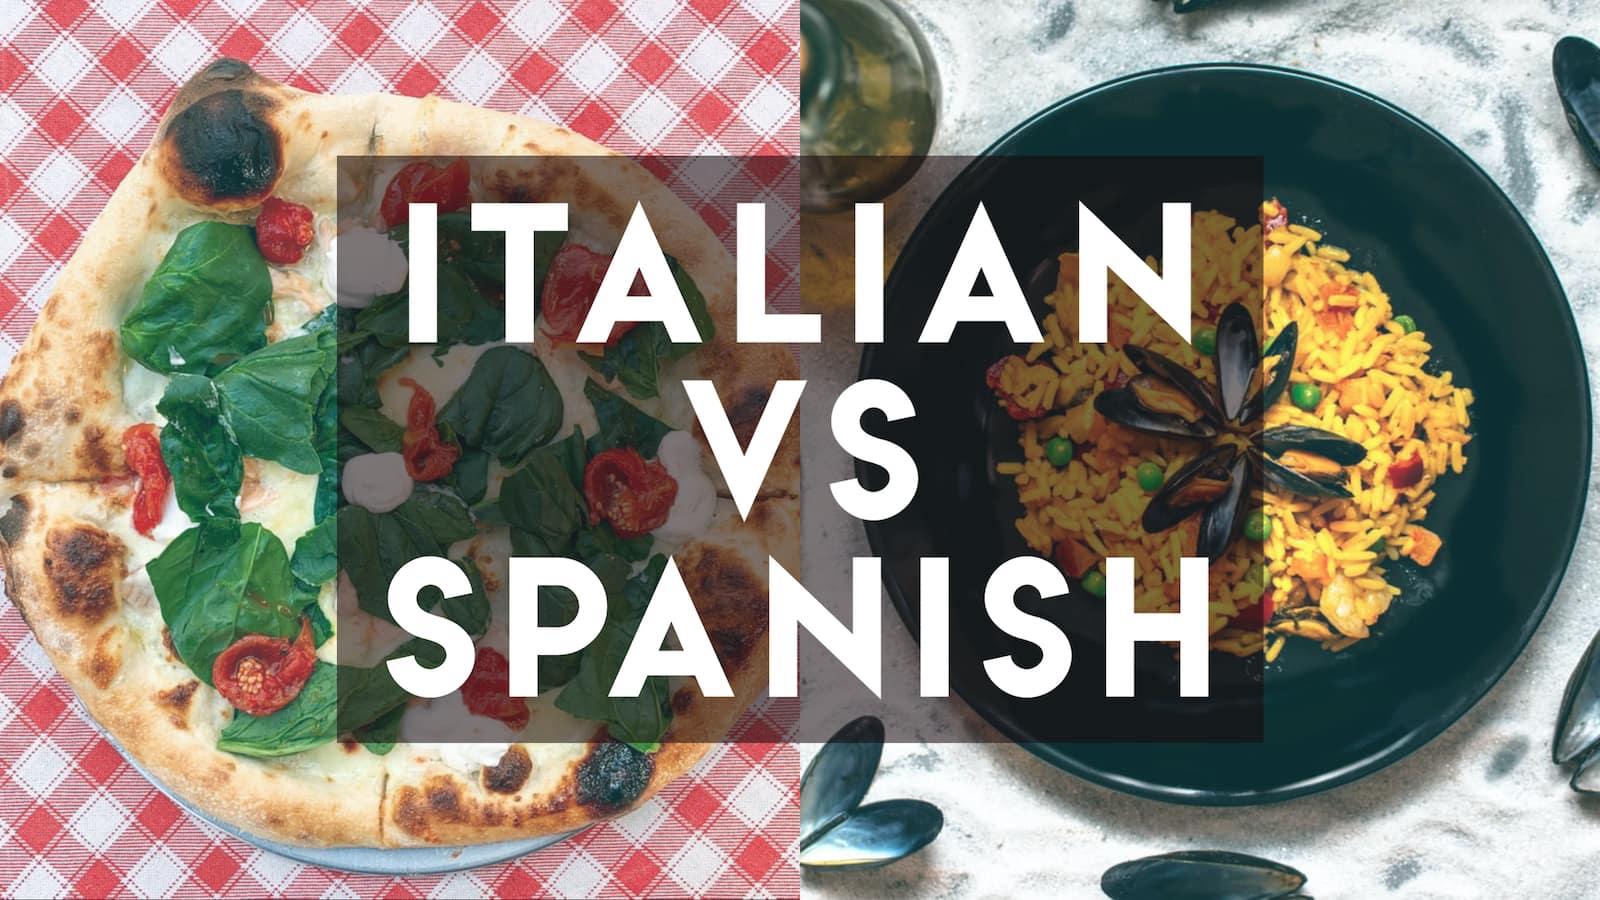 Italian vs Spanish text over overlay of pizza and paella